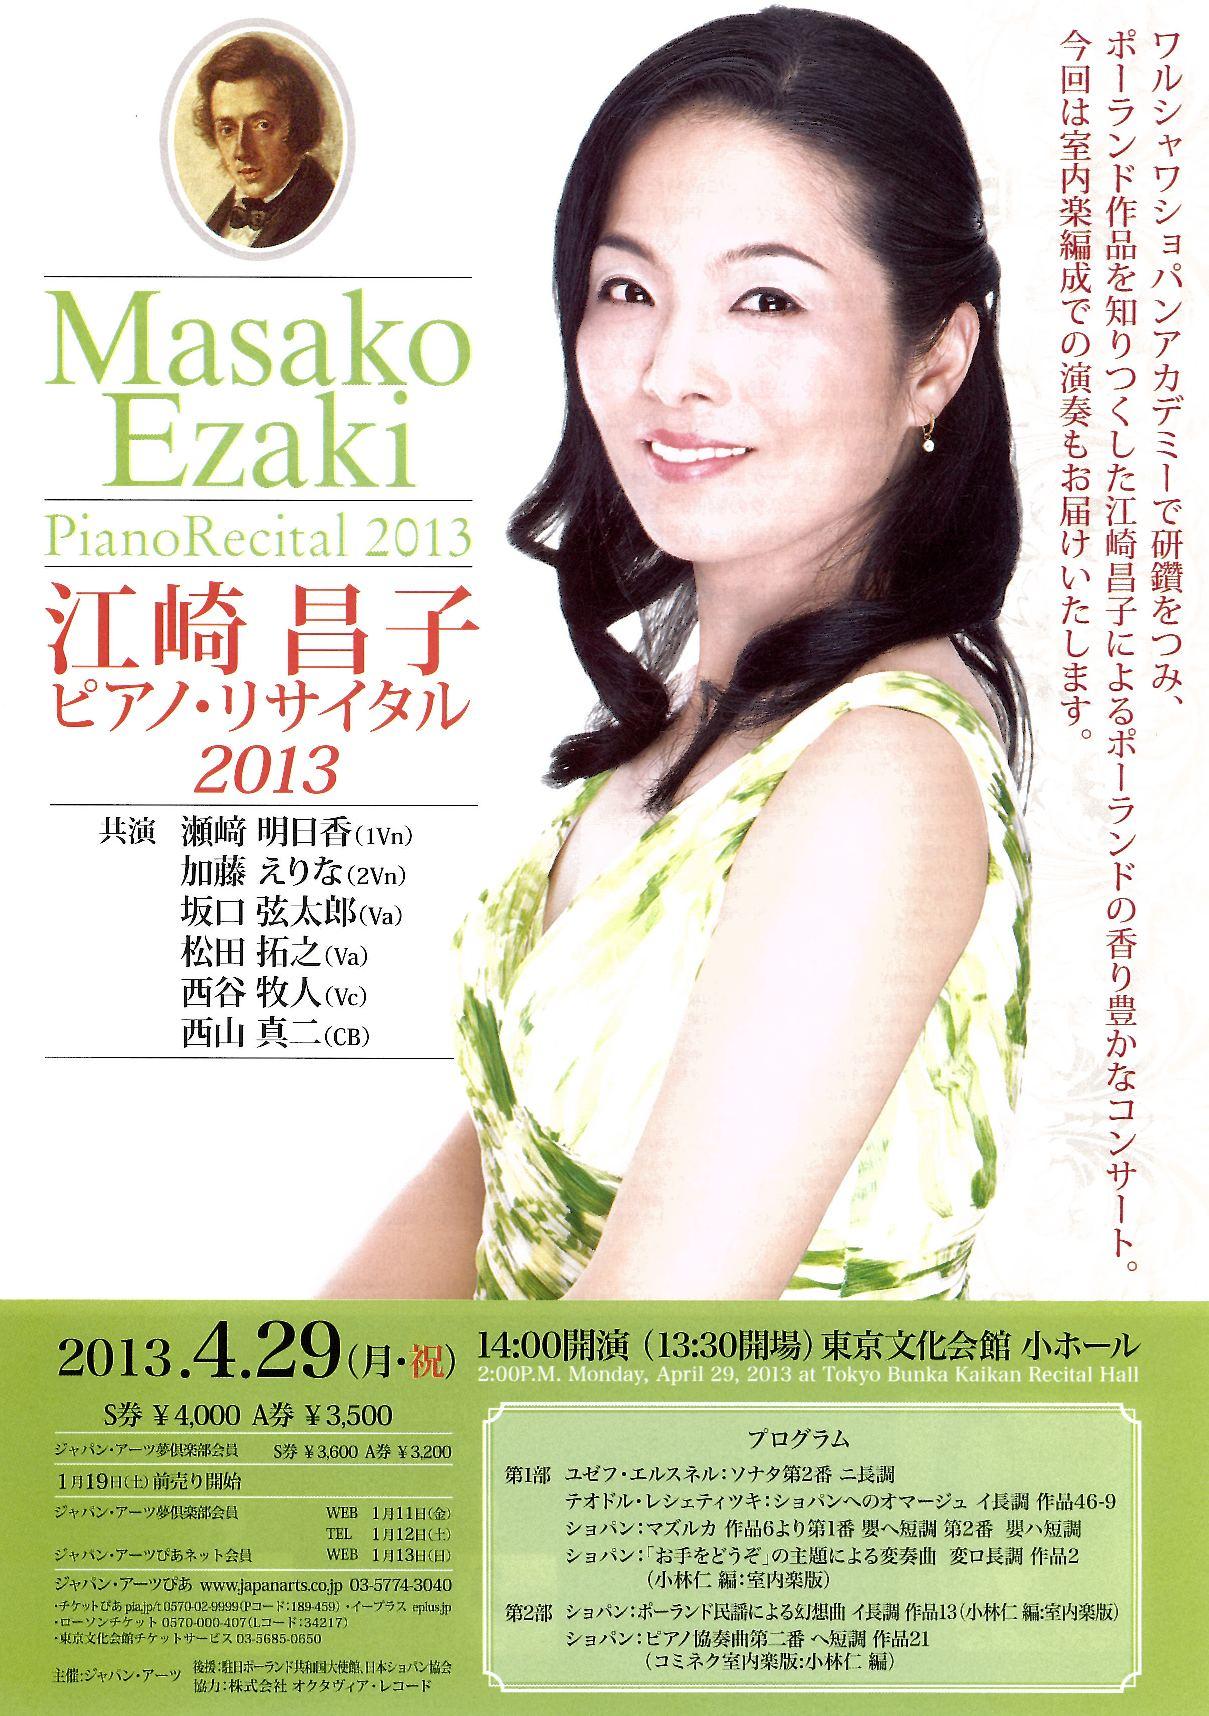 Masako-chirashi-1.jpg